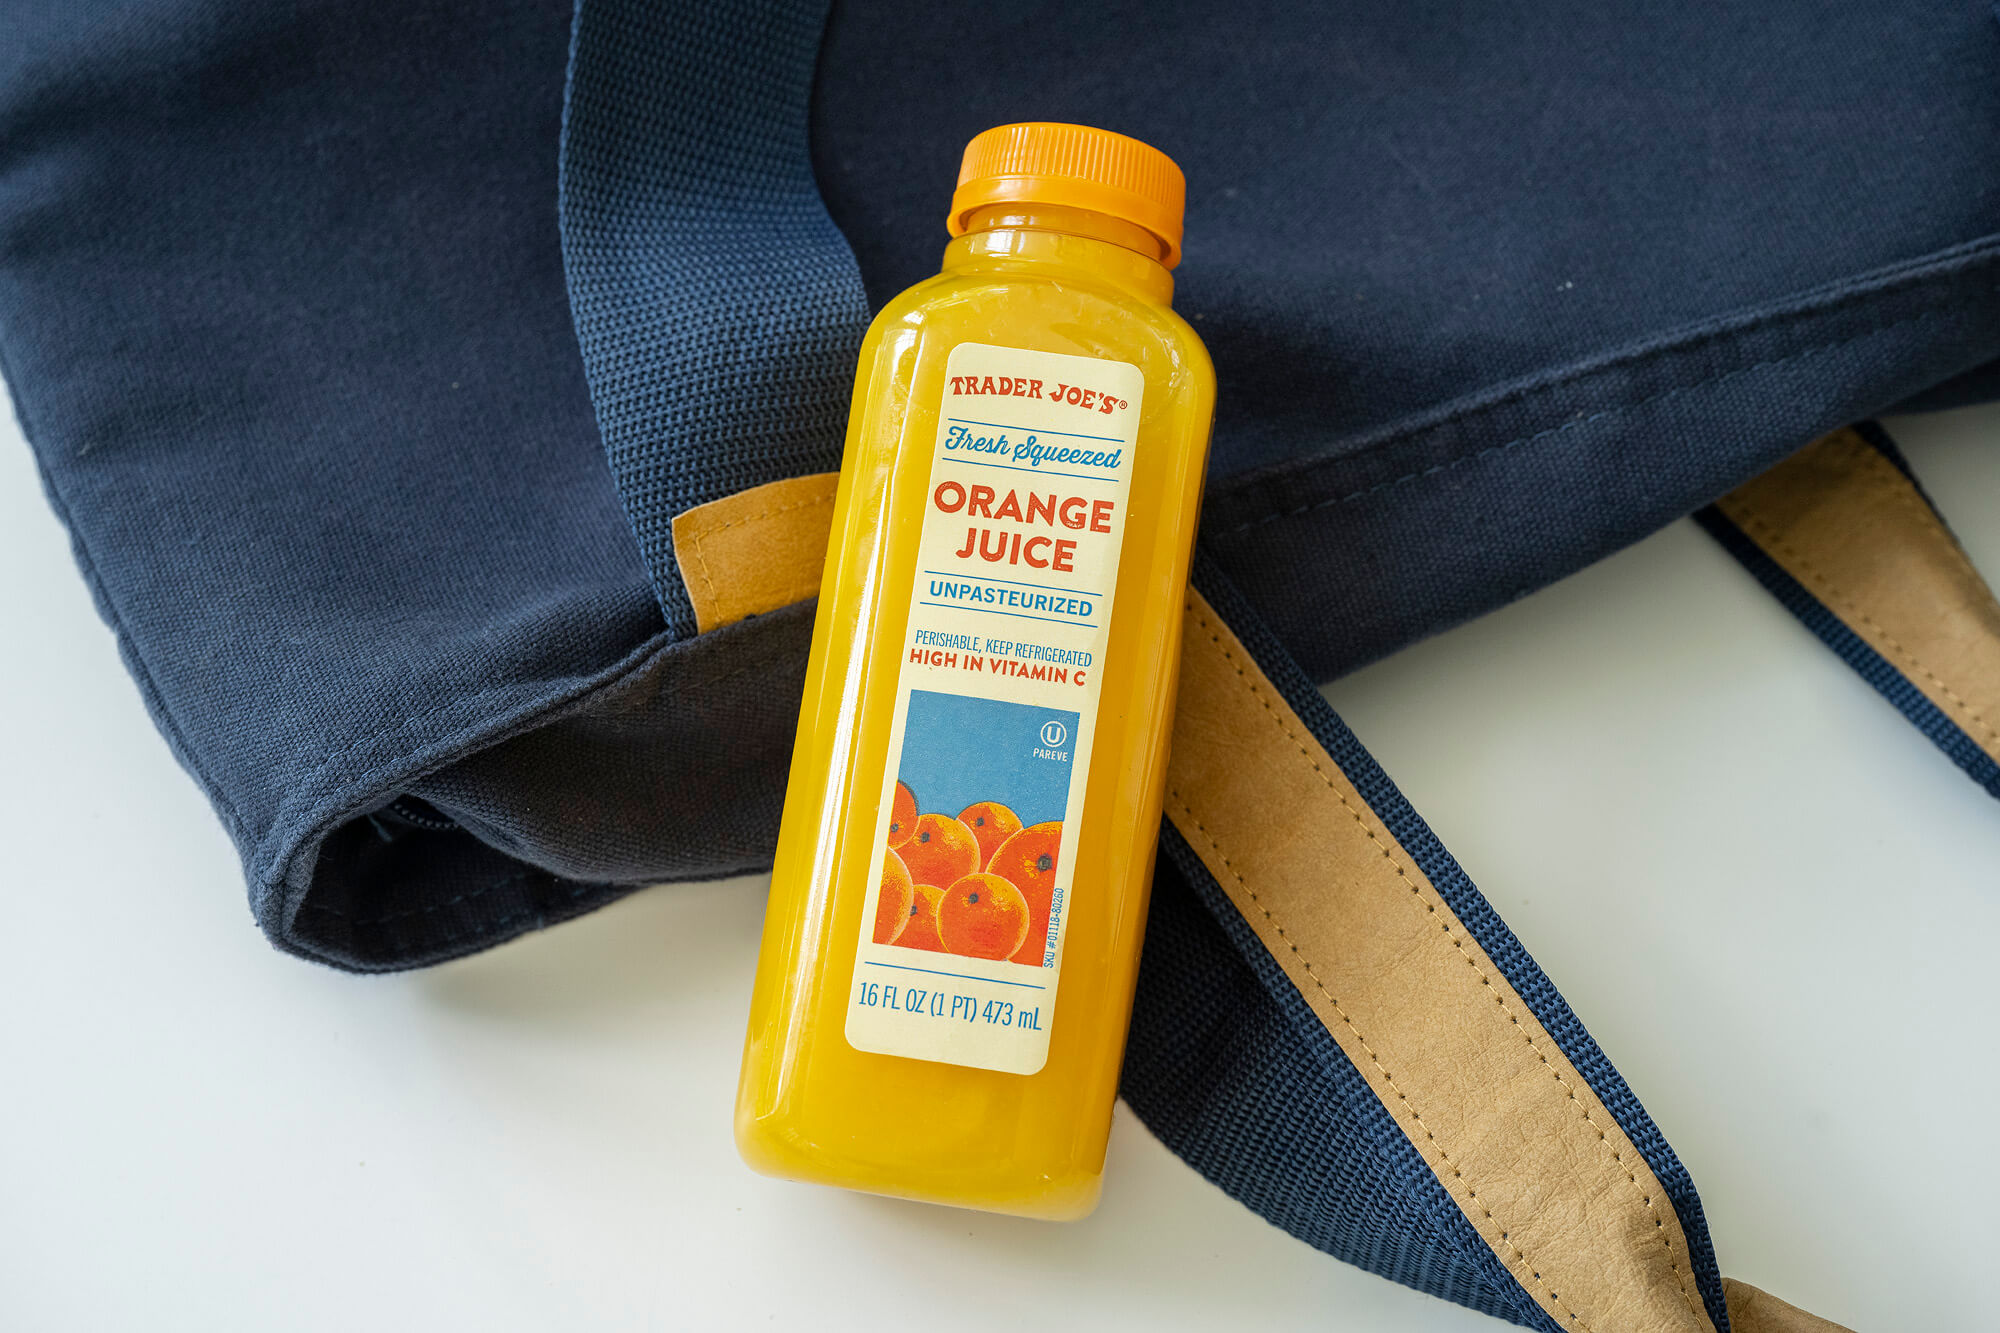 Trader Joe's Fresh Squeezed Orange Juice